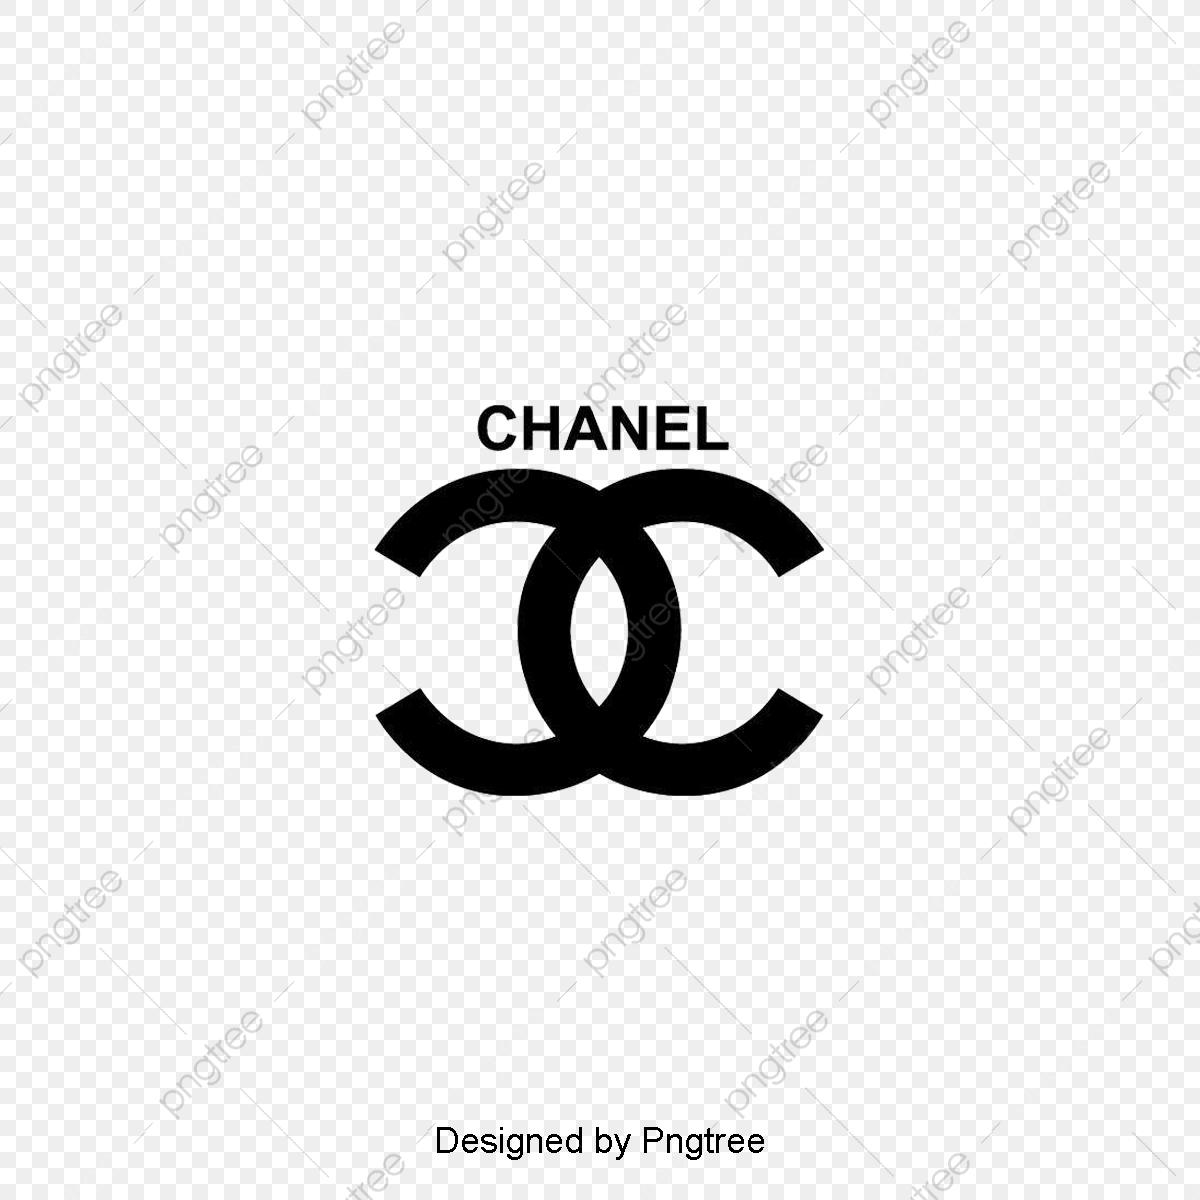 Chanel Logo Design, Chanel, Luxury, France Png Transparent Clipart Pluspng.com  - Chanel Logo PNG